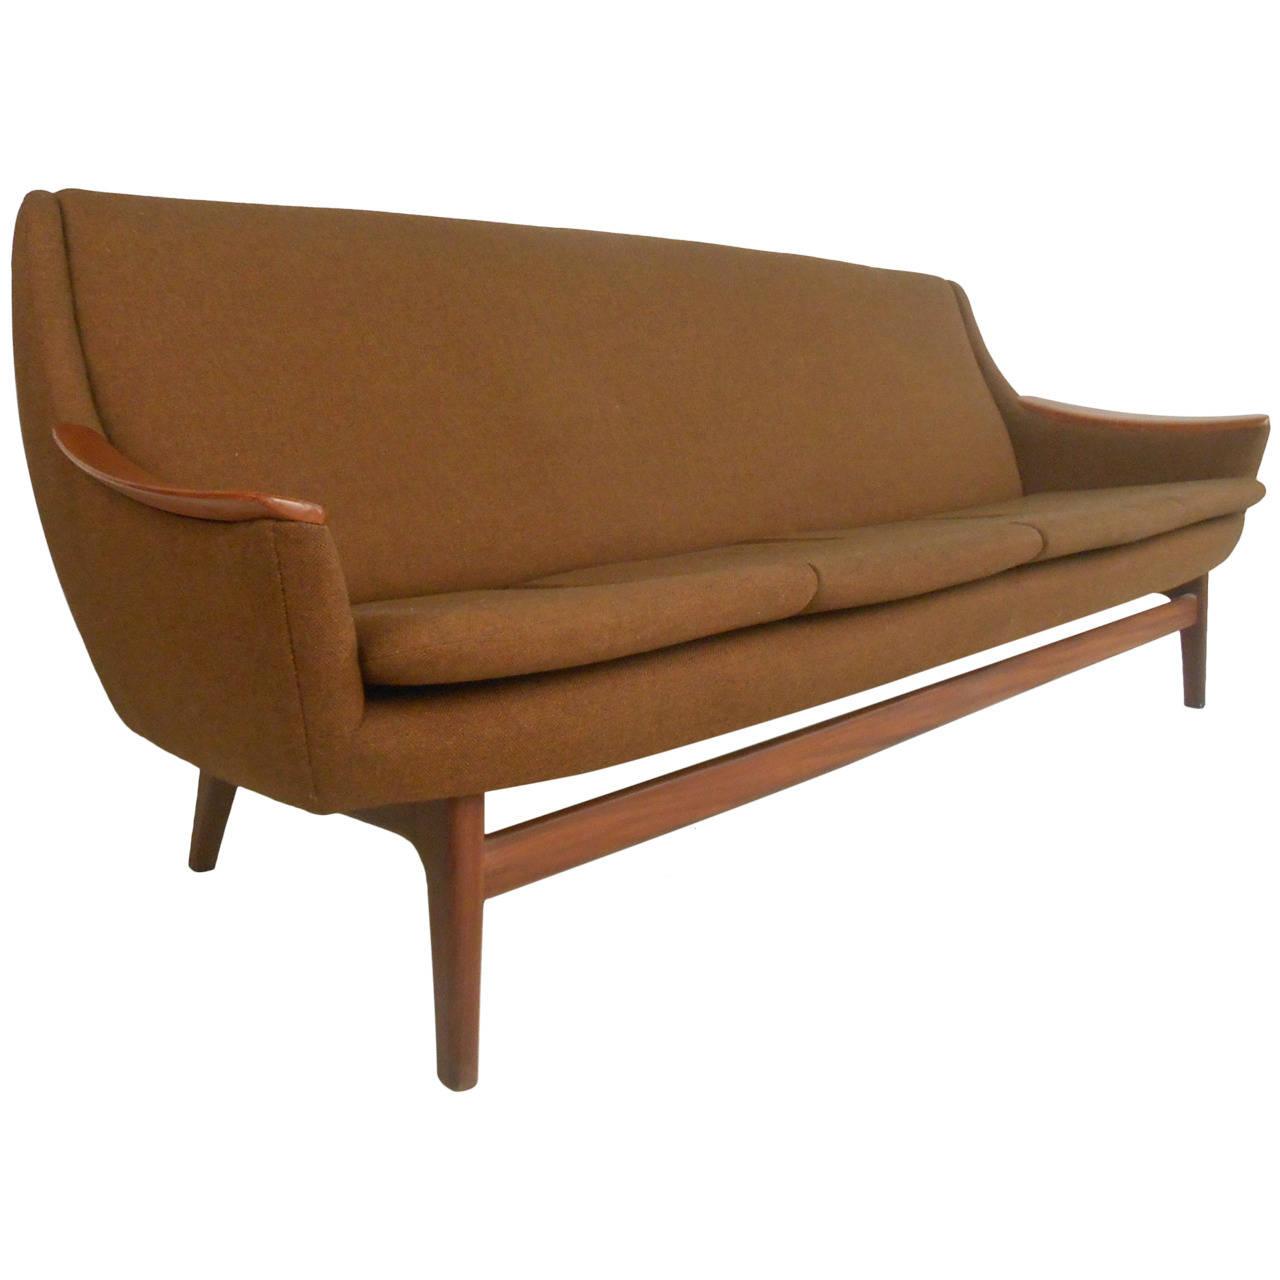 Sculptural Danish Modern Sofa 1stdibs Com Danish Modern Sofa Mid Century Modern Sofa Modern Sofa